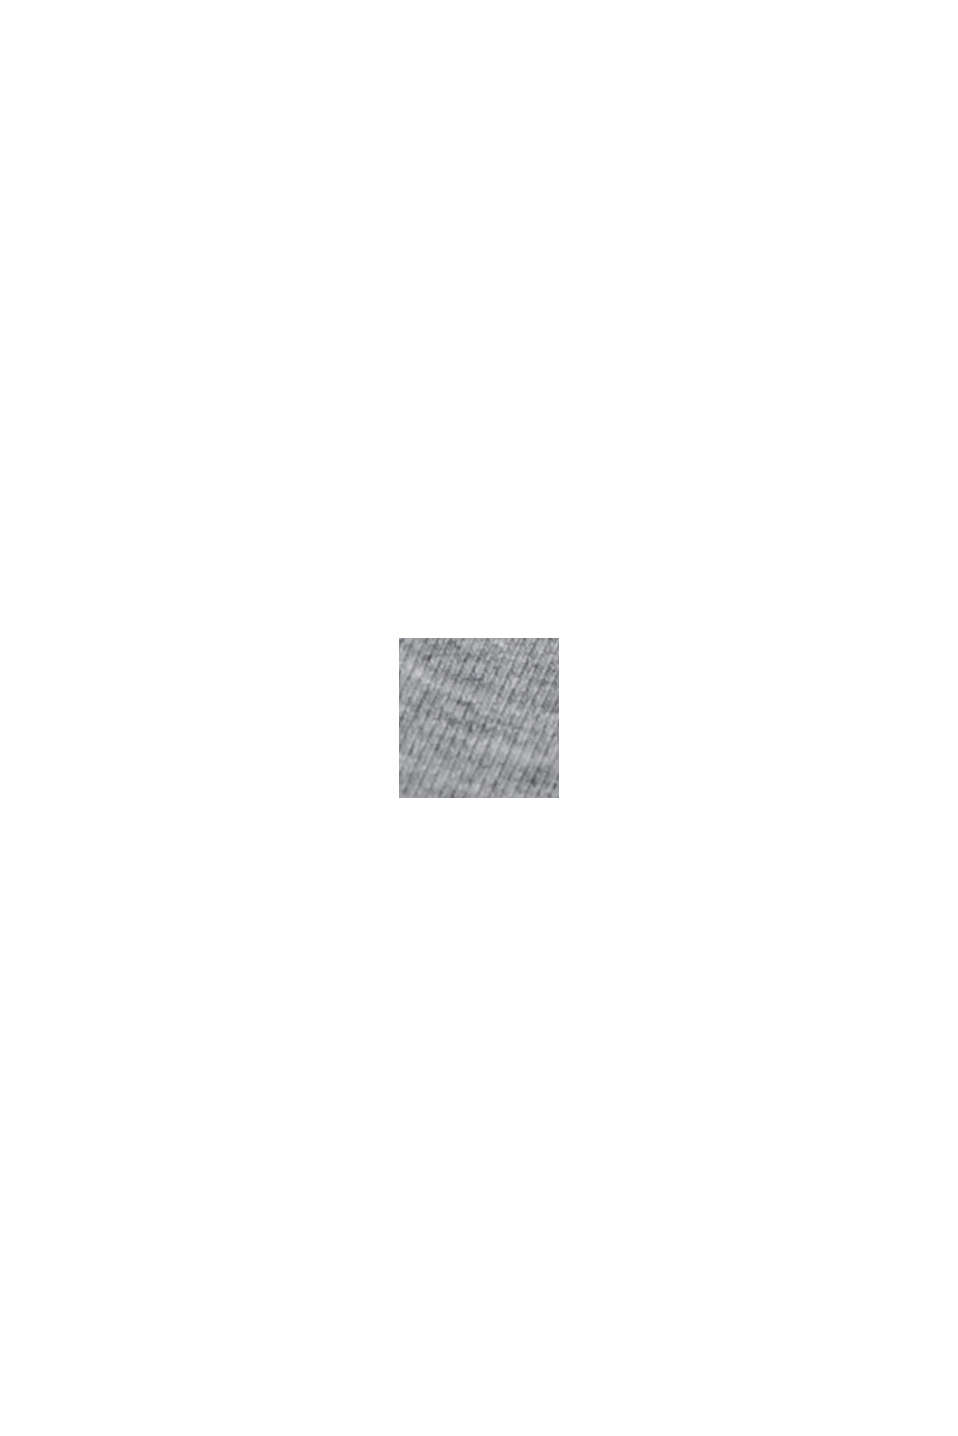 Jupe longueur midi en jersey de coton bio mélangé, MEDIUM GREY, swatch